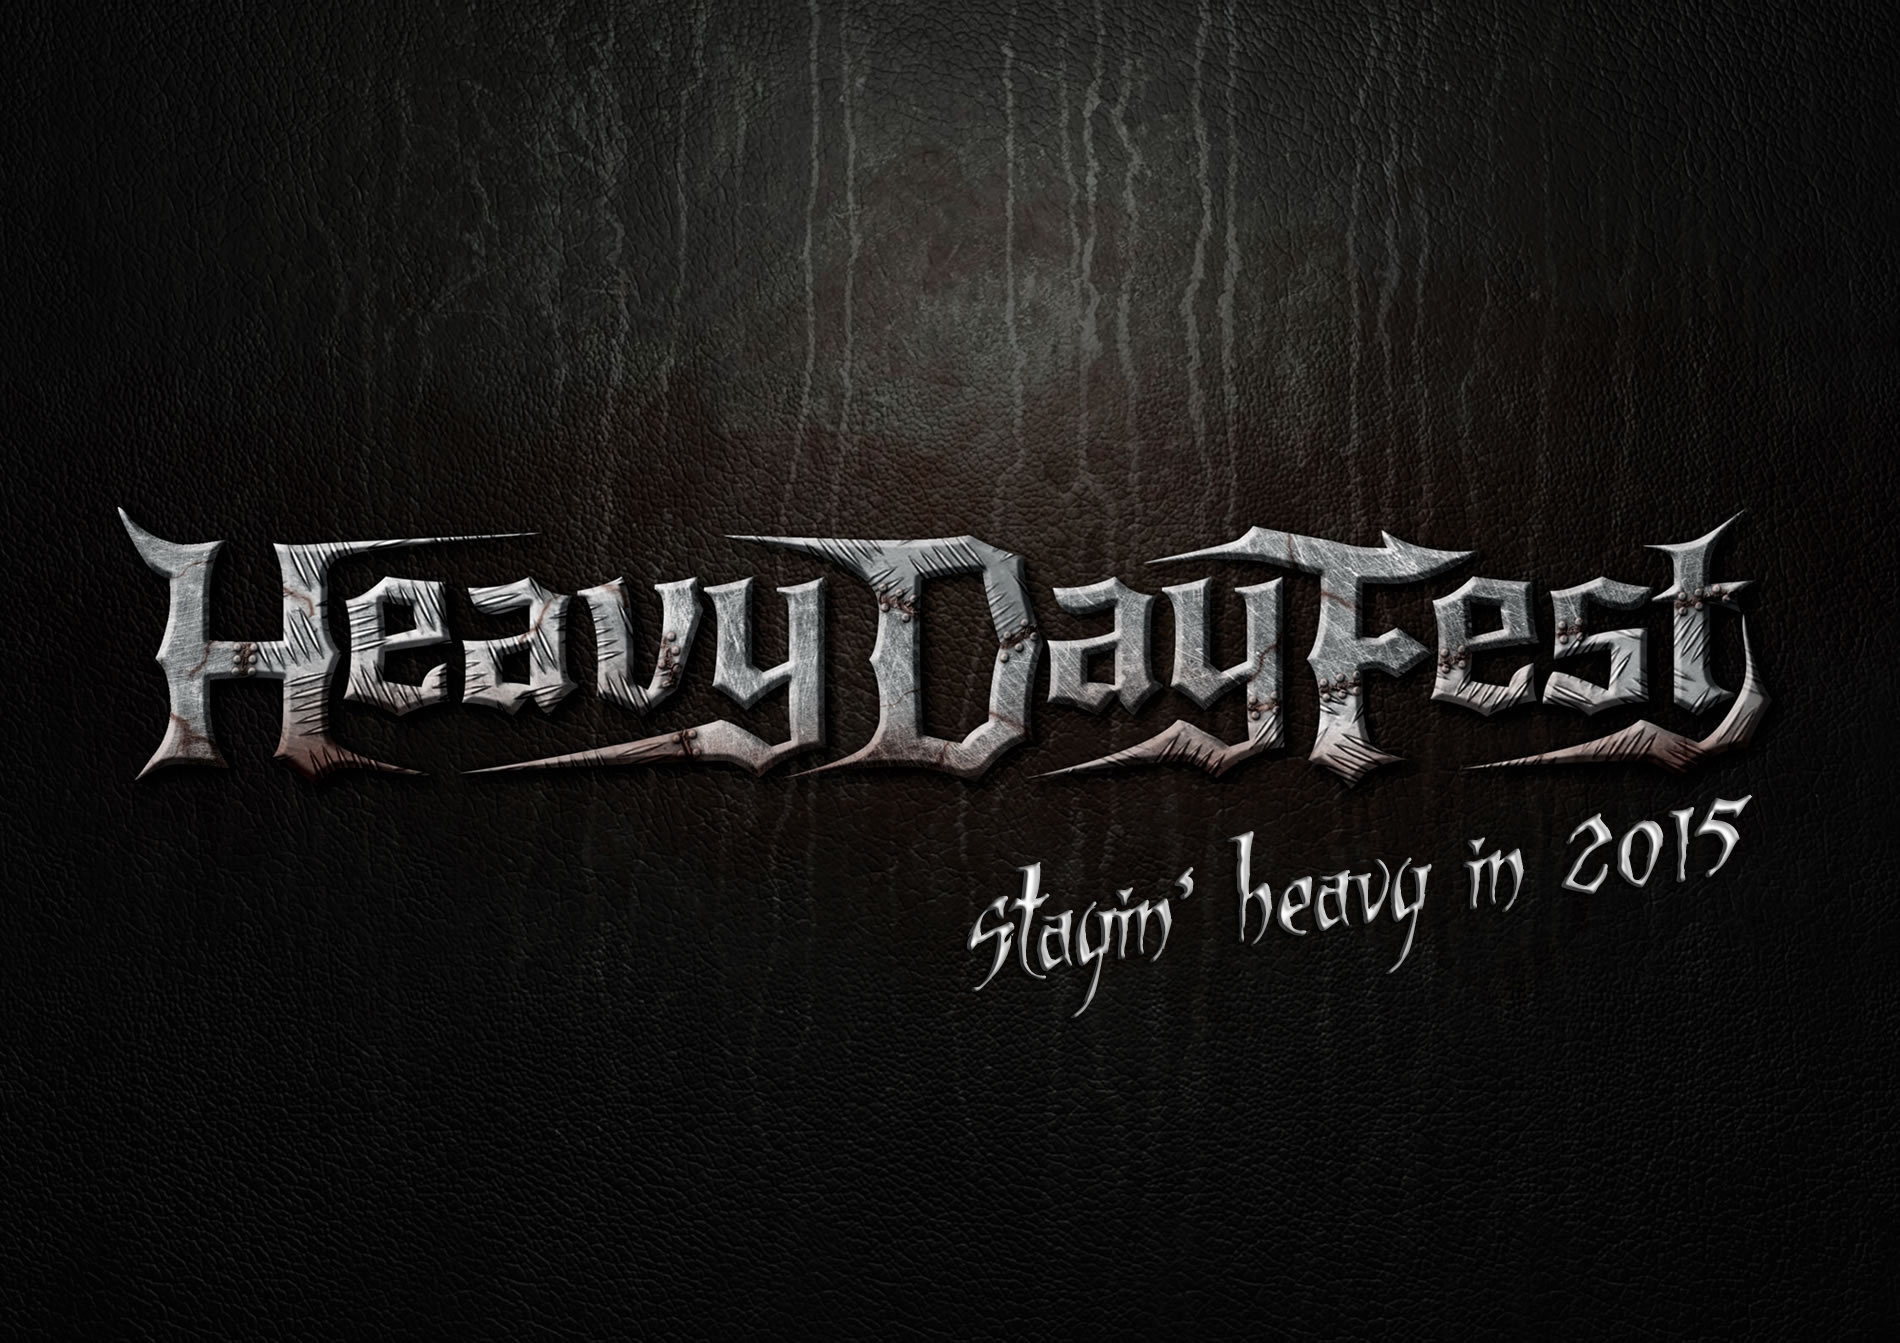 heavydayfest